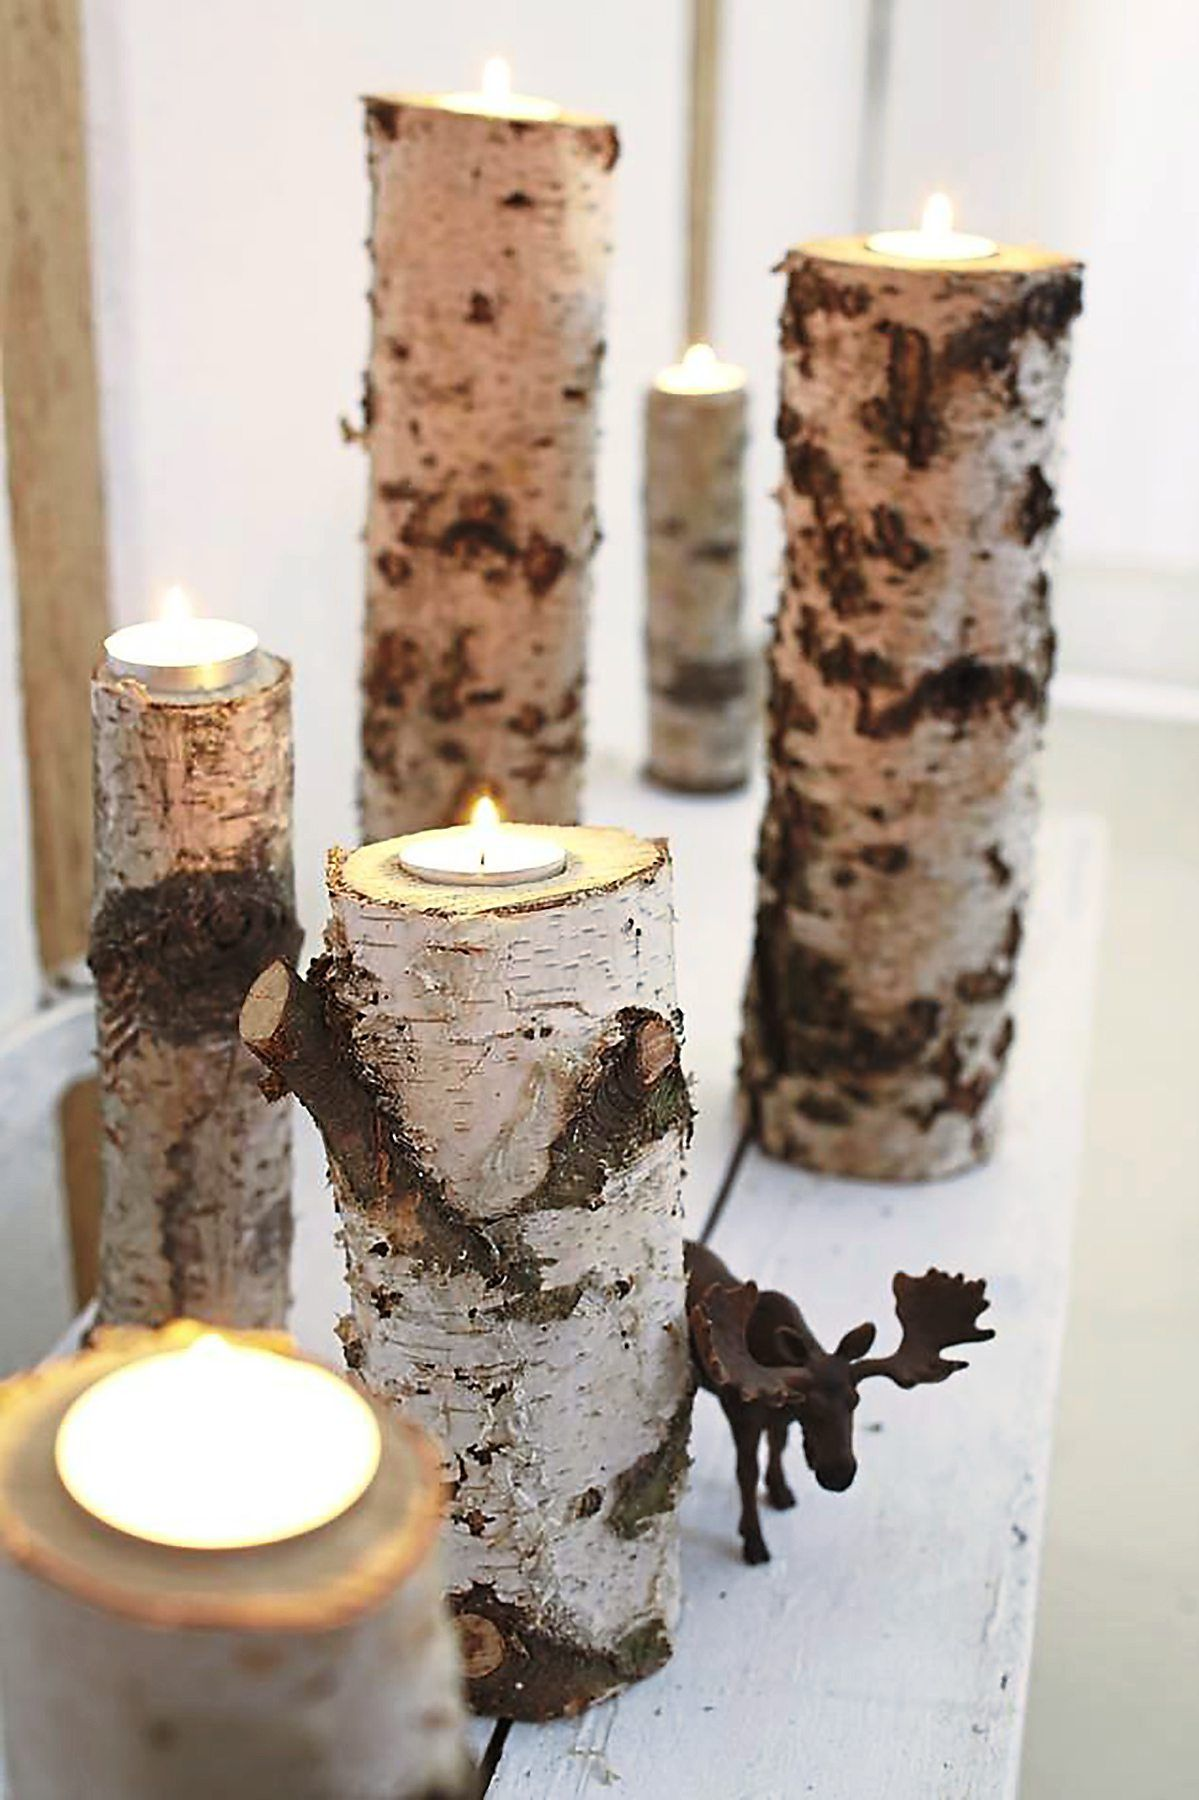 Birch trunks can easily be transformed into tea light holders. Photo: Bosch/DIY Acadamy/dpa